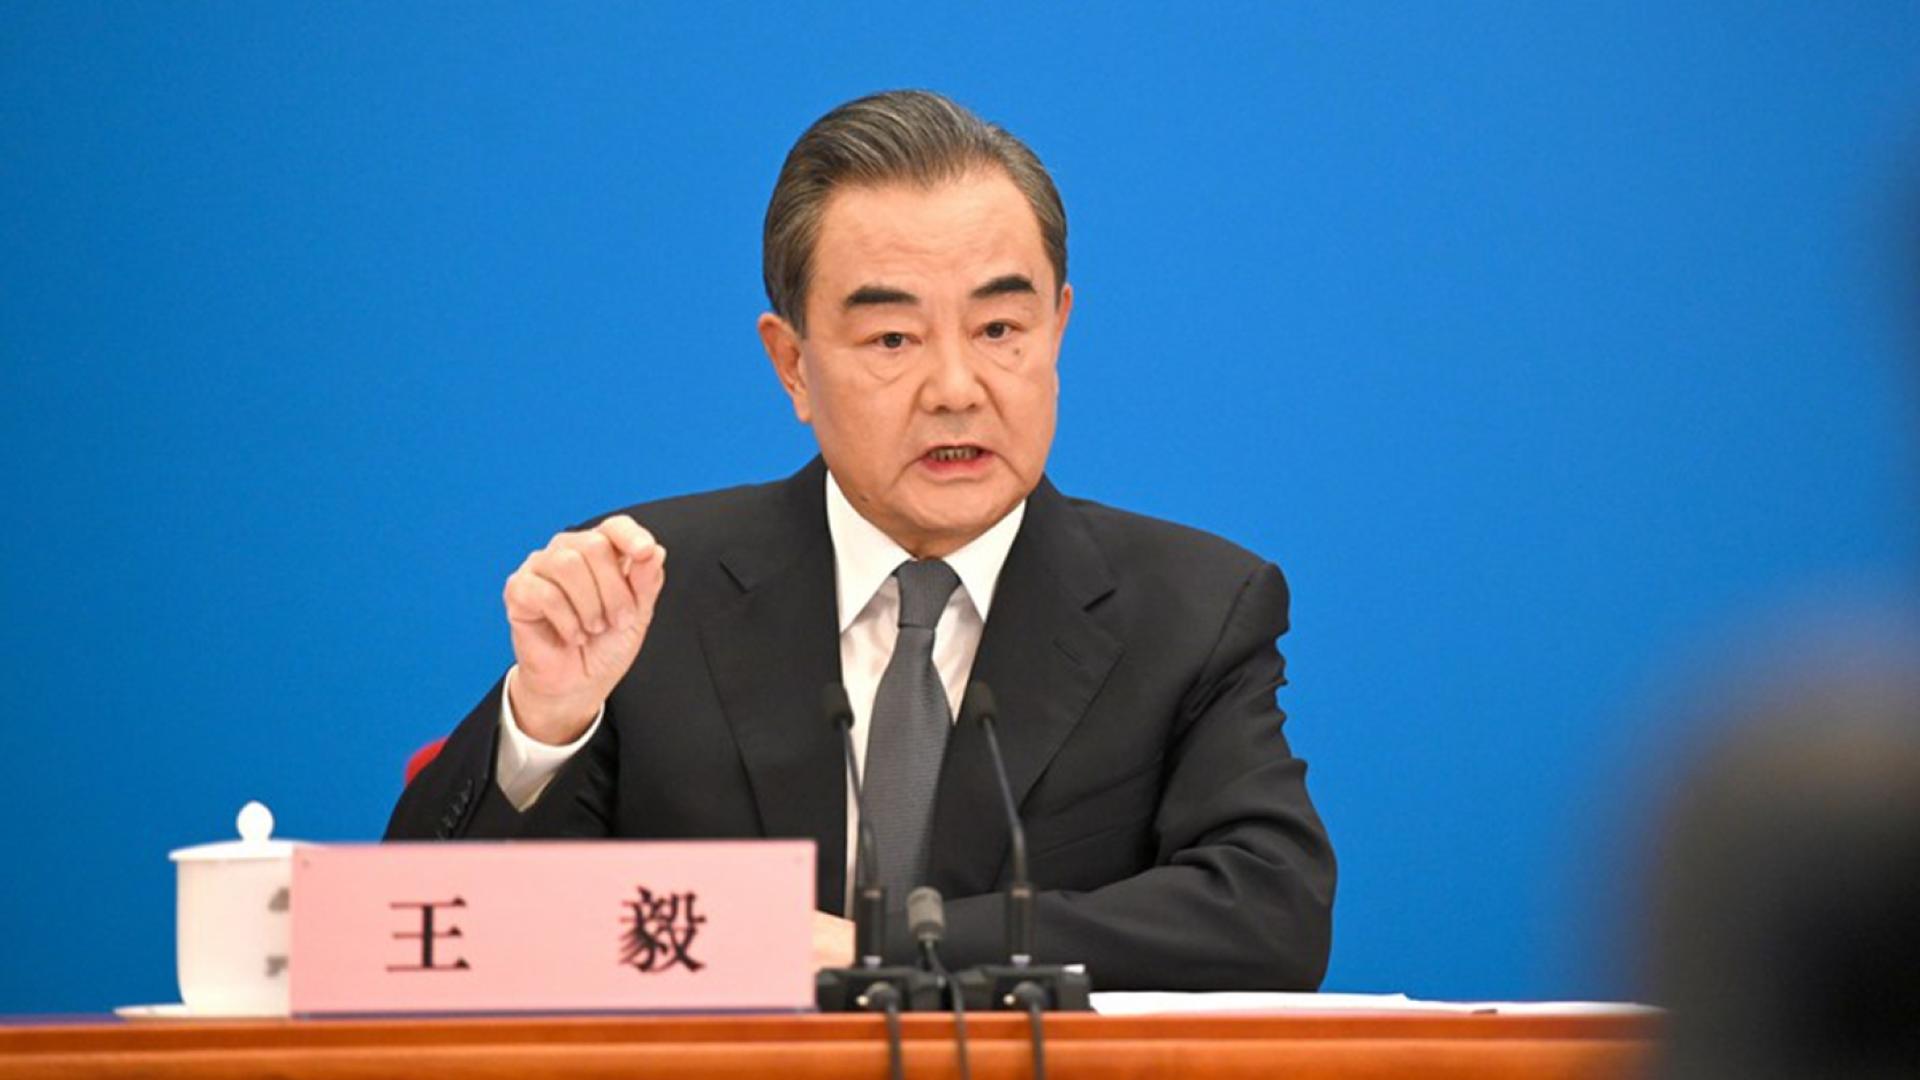 Chinese Foreign Minister Wang Yi - Sputnik International, 1920, 05.08.2021